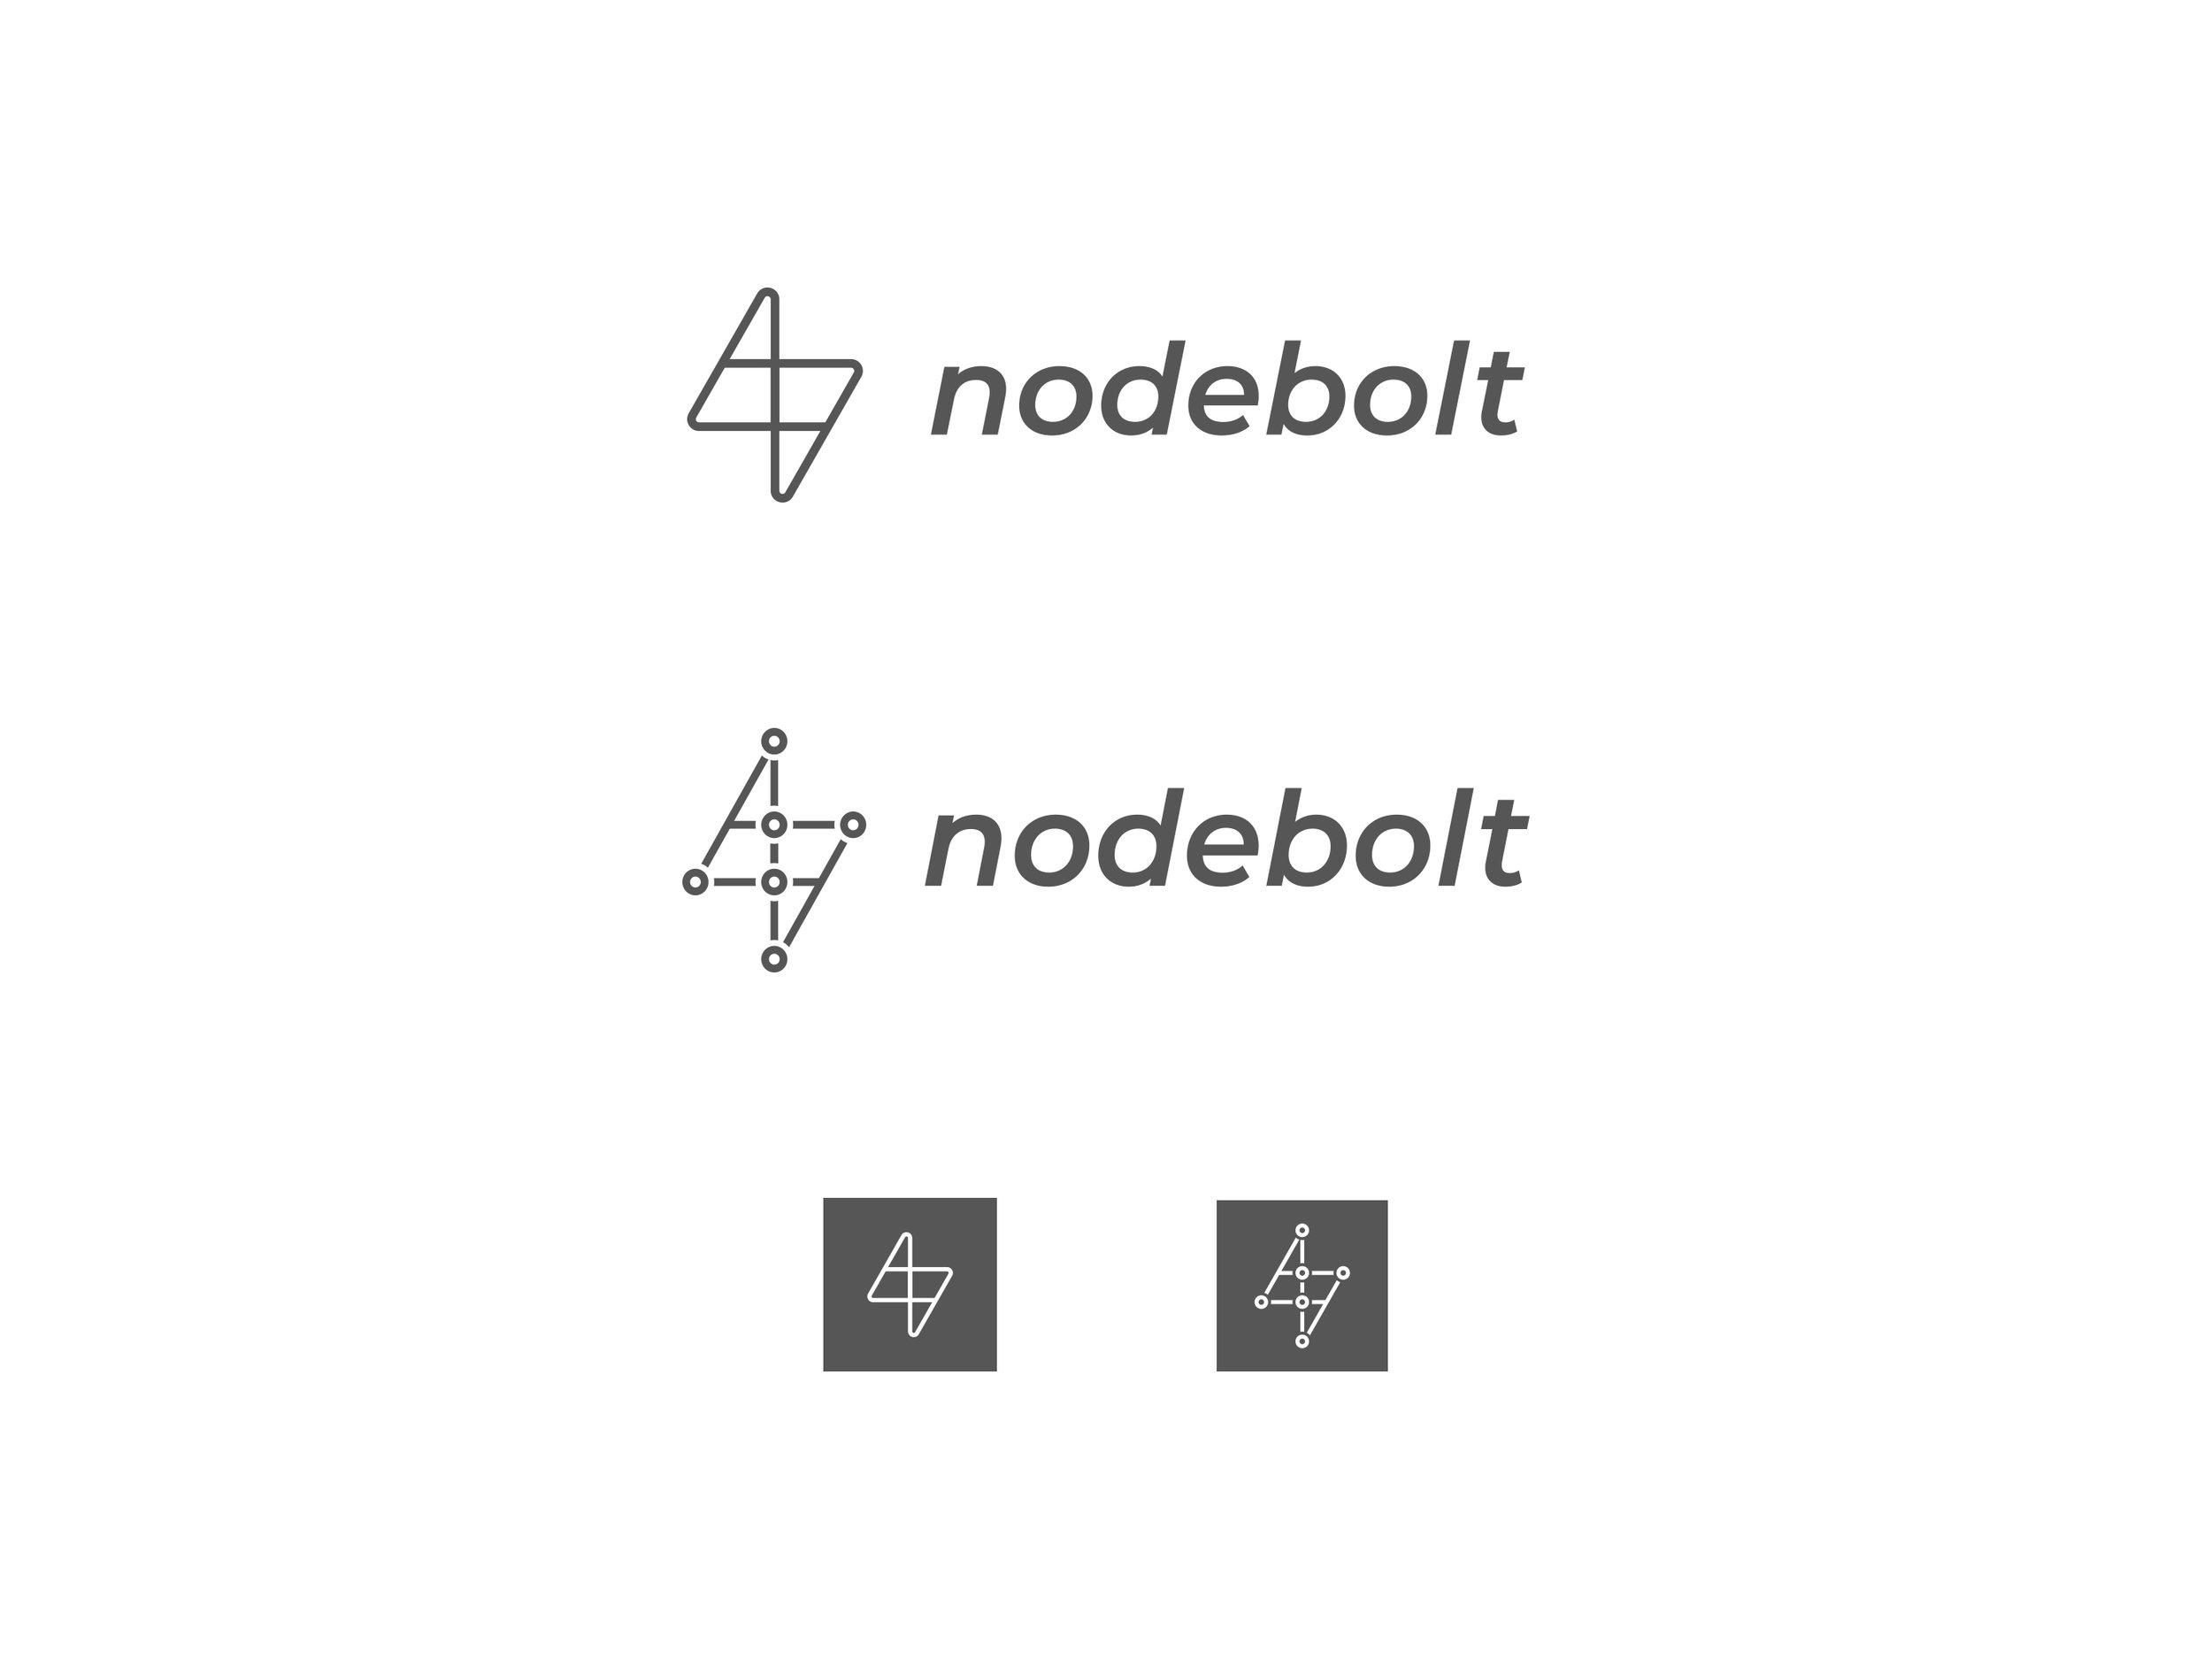 Nodebolt-Projectimage-04.jpg